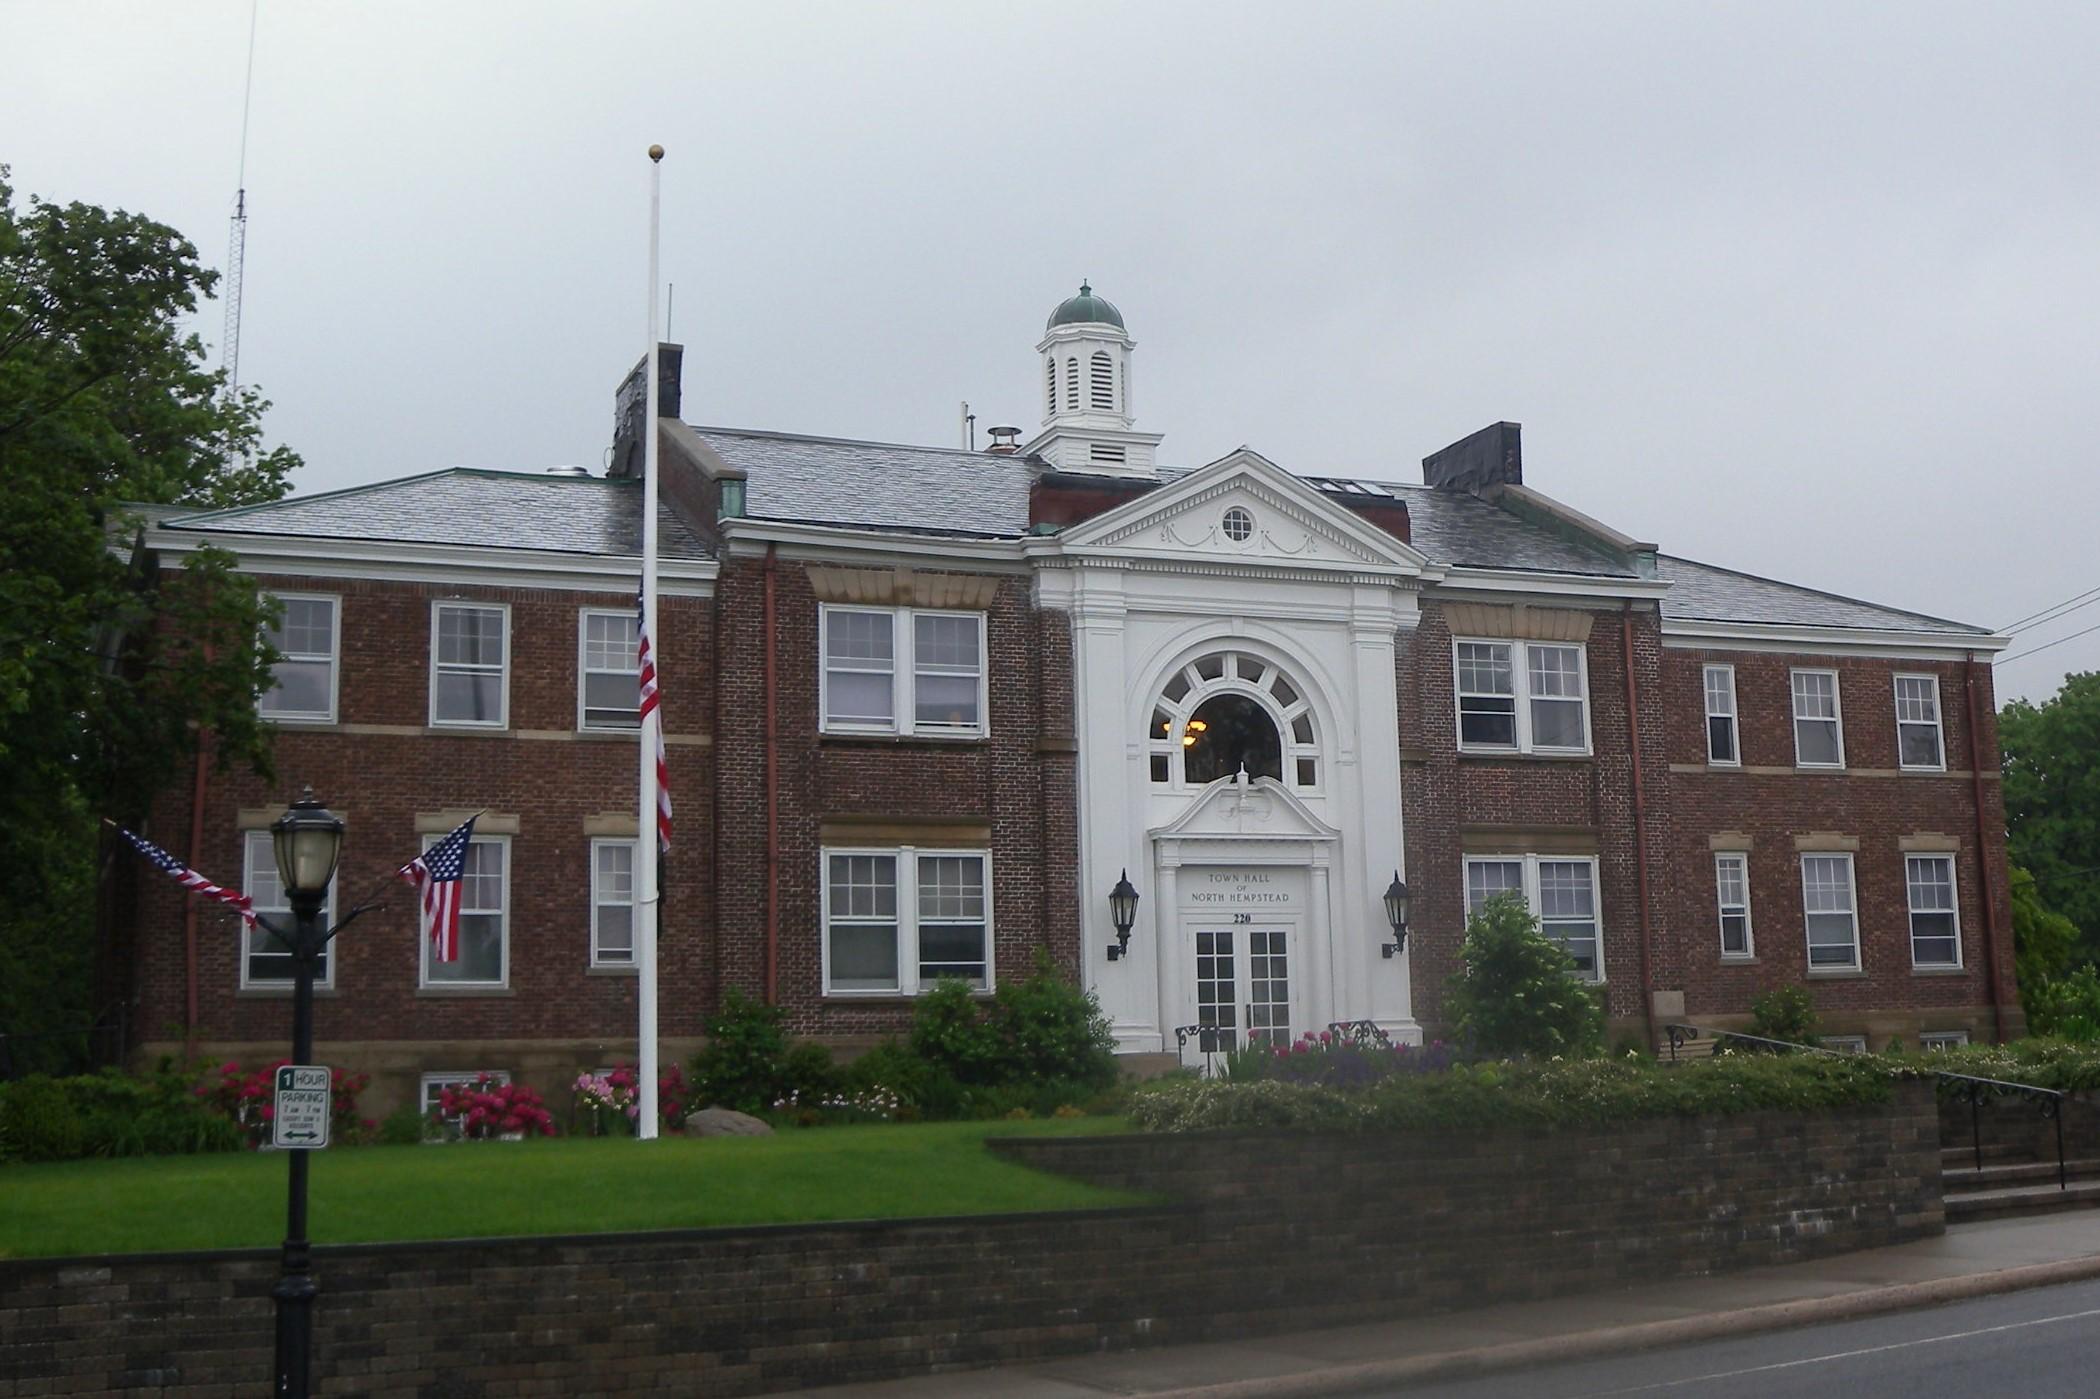 North Hempstead fiscal stress test score among top on LI, report says